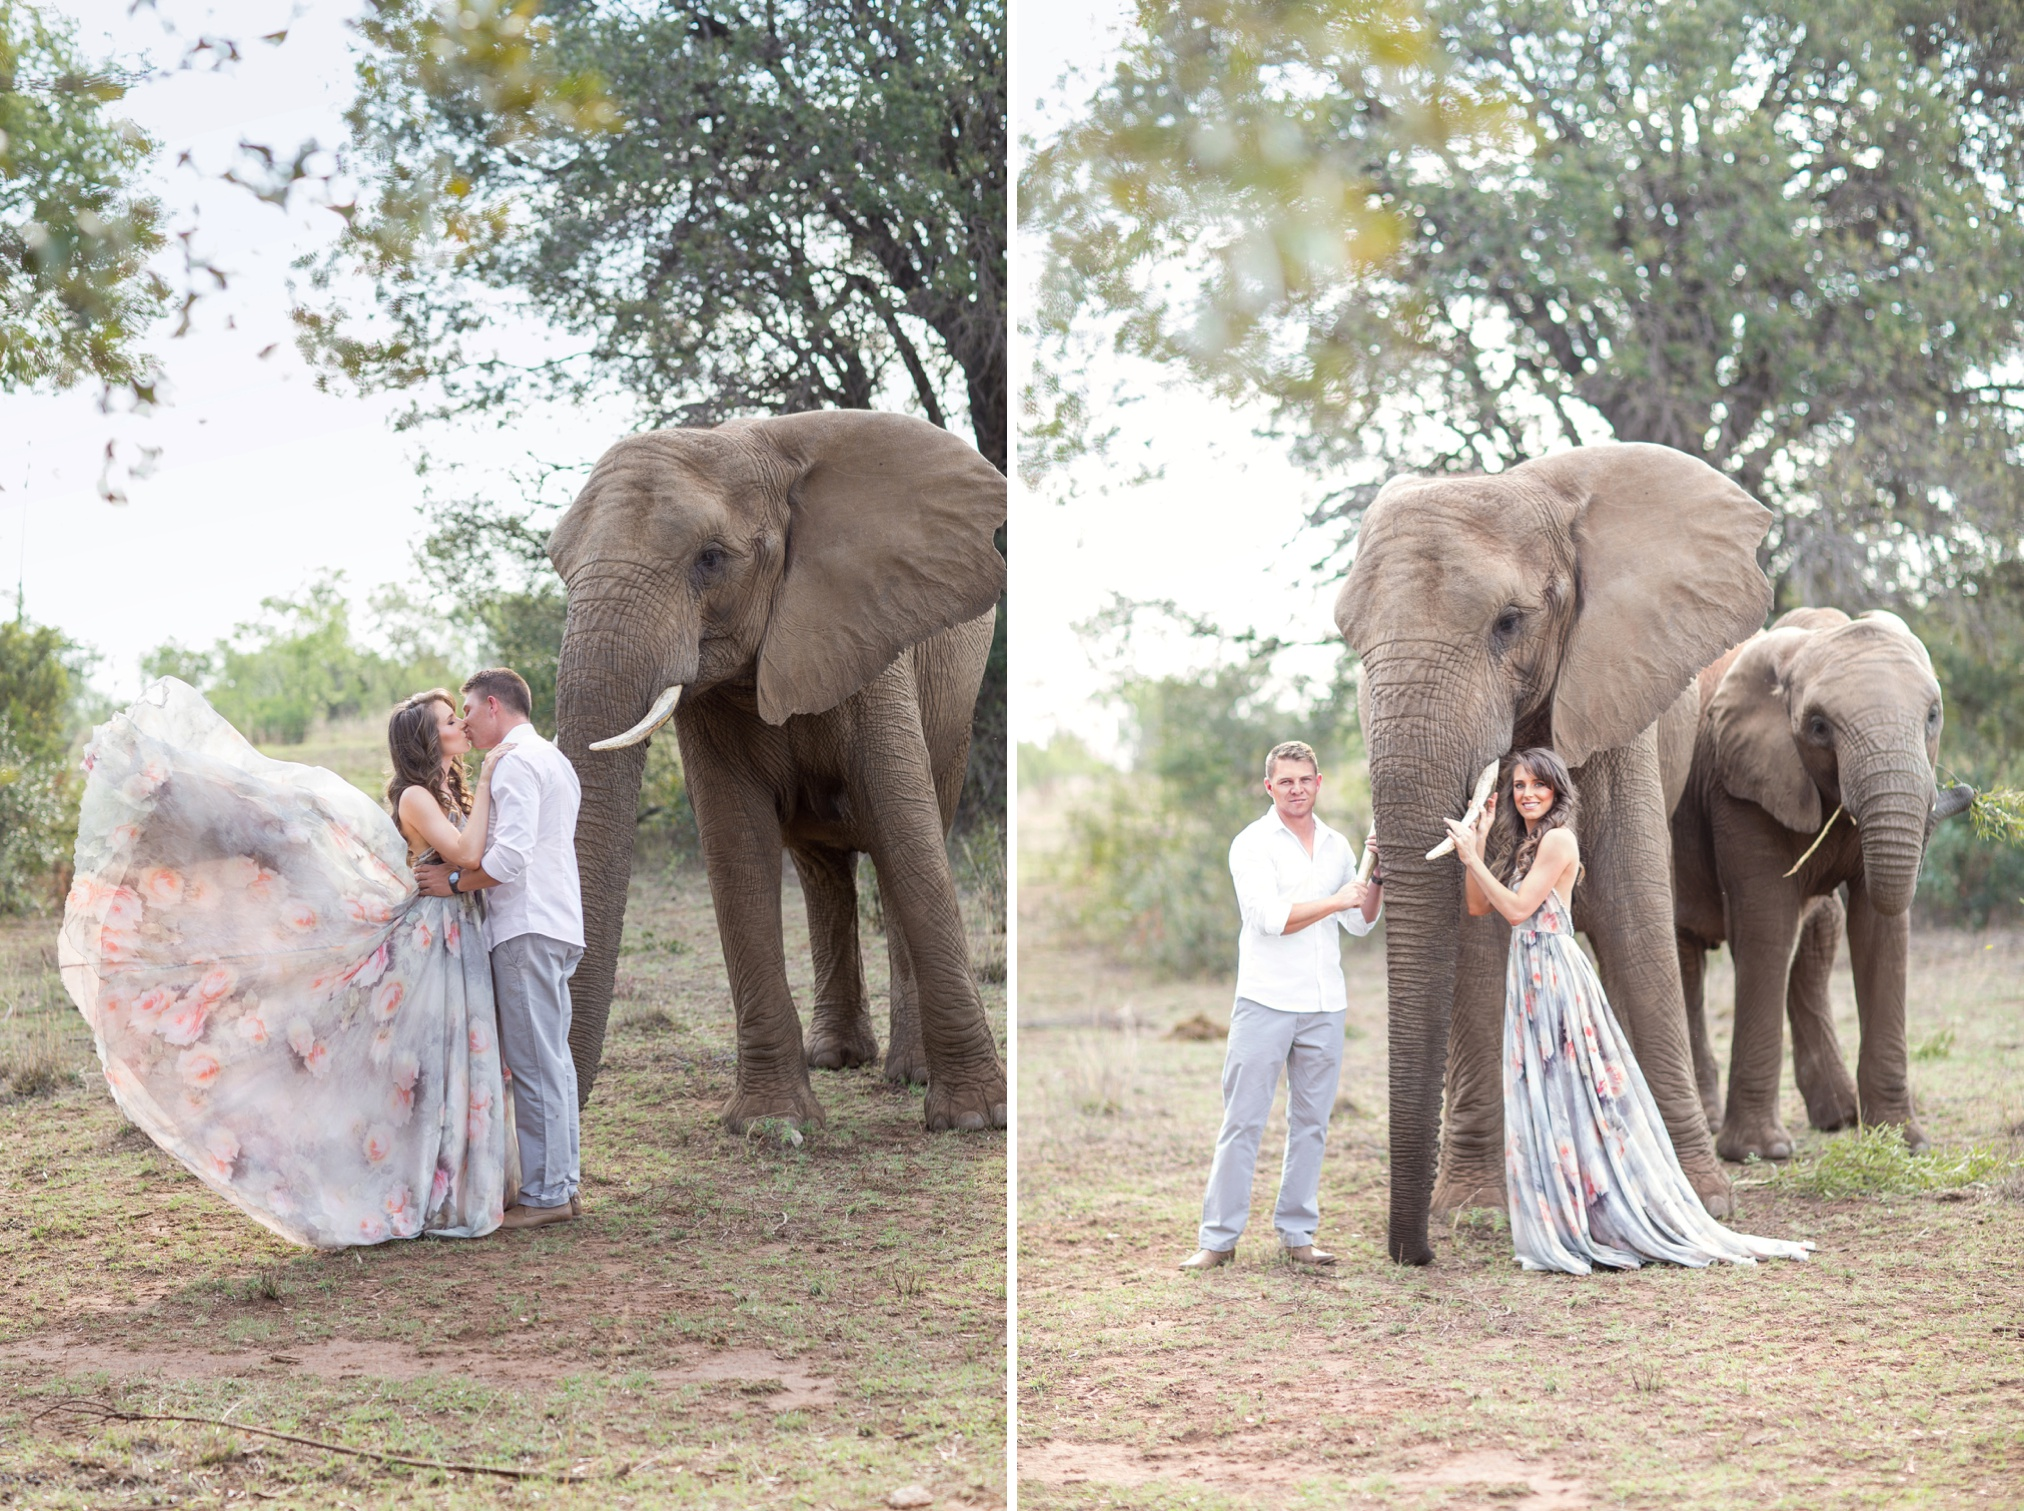 Glen_Afric_Kyle_and_Lindsay_engagement_elephants_safari_6